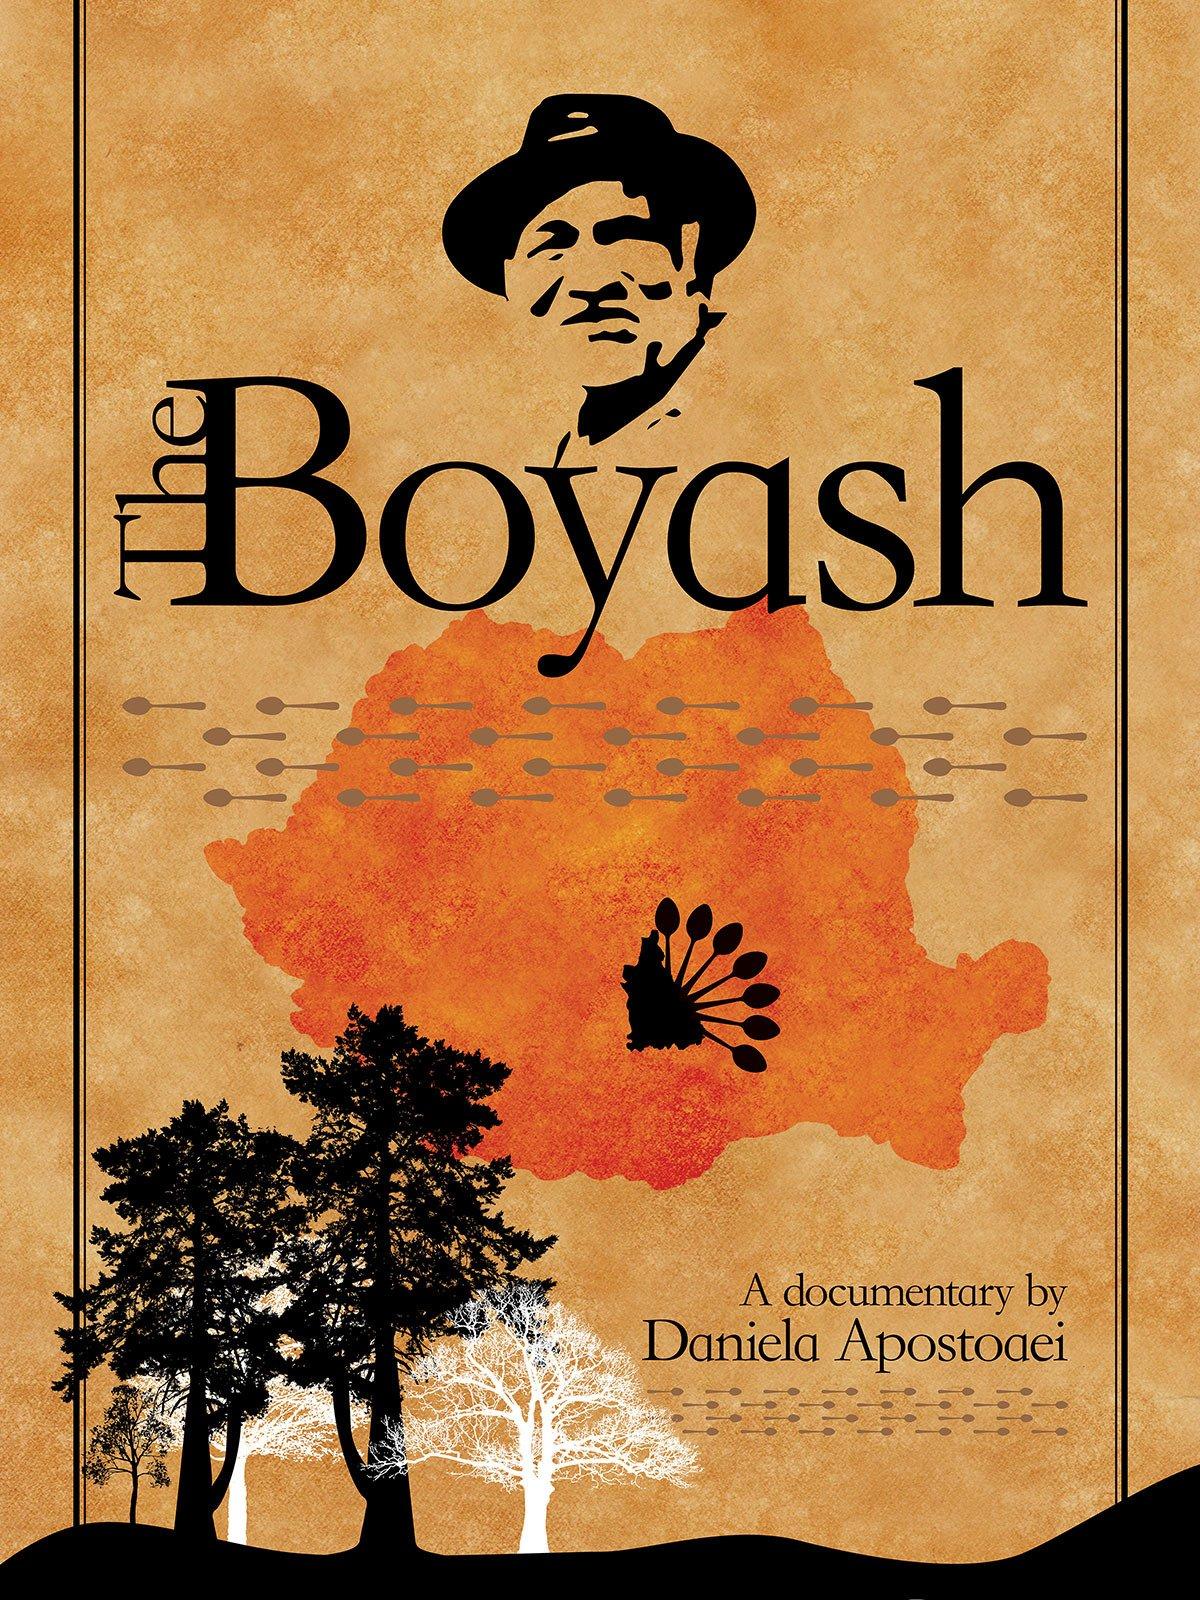 The Boyash